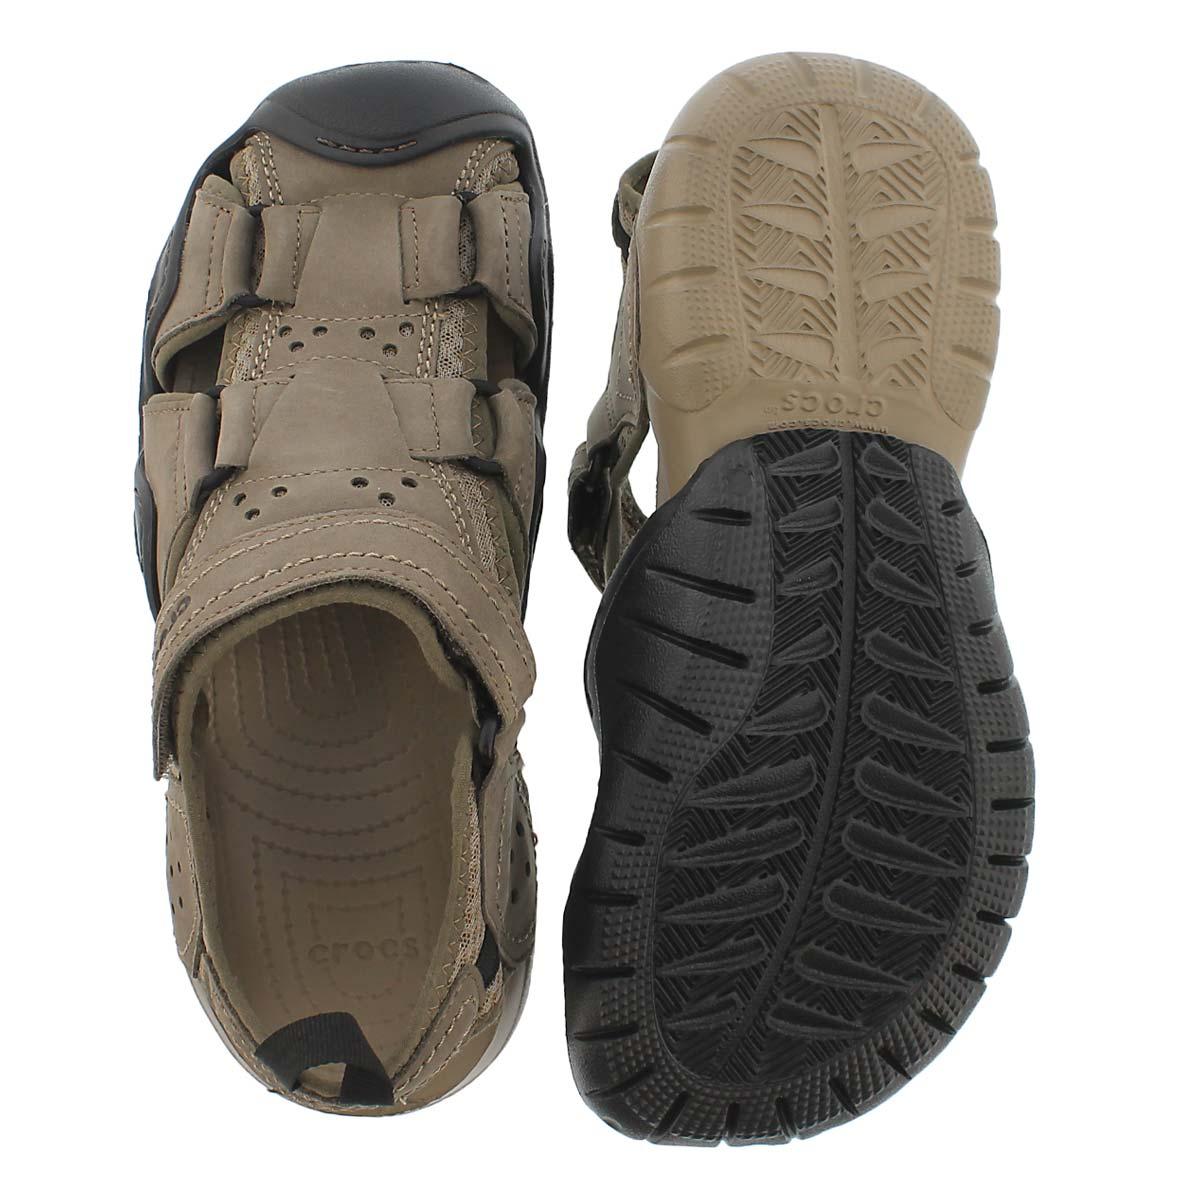 Mns Swiftwater walnut fisherman sandal